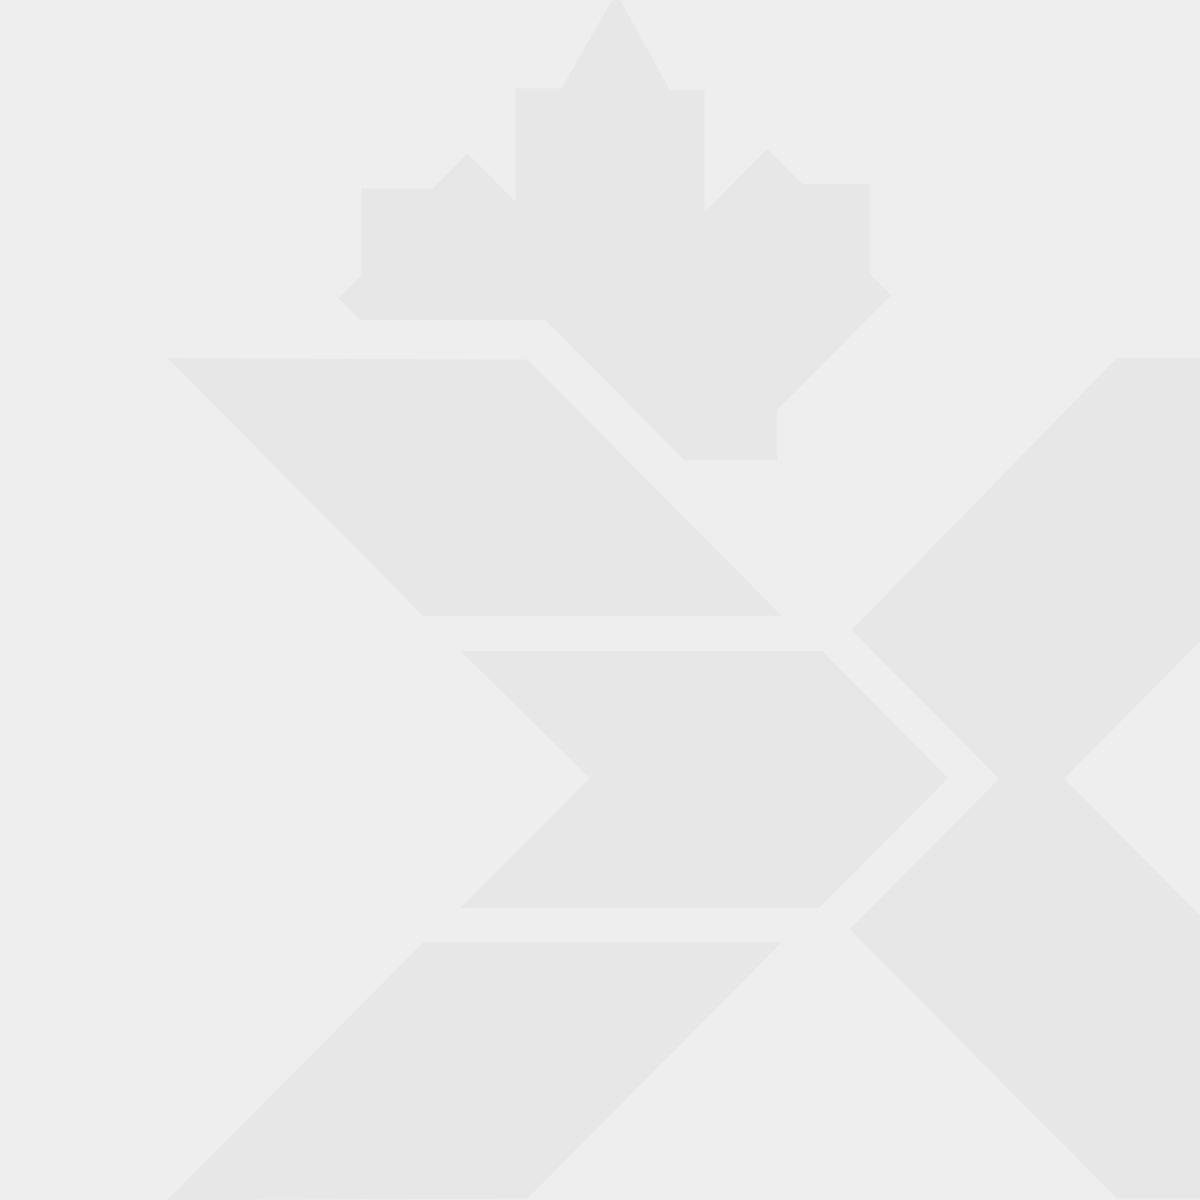 CF-18 Demo Team 2019 Coin